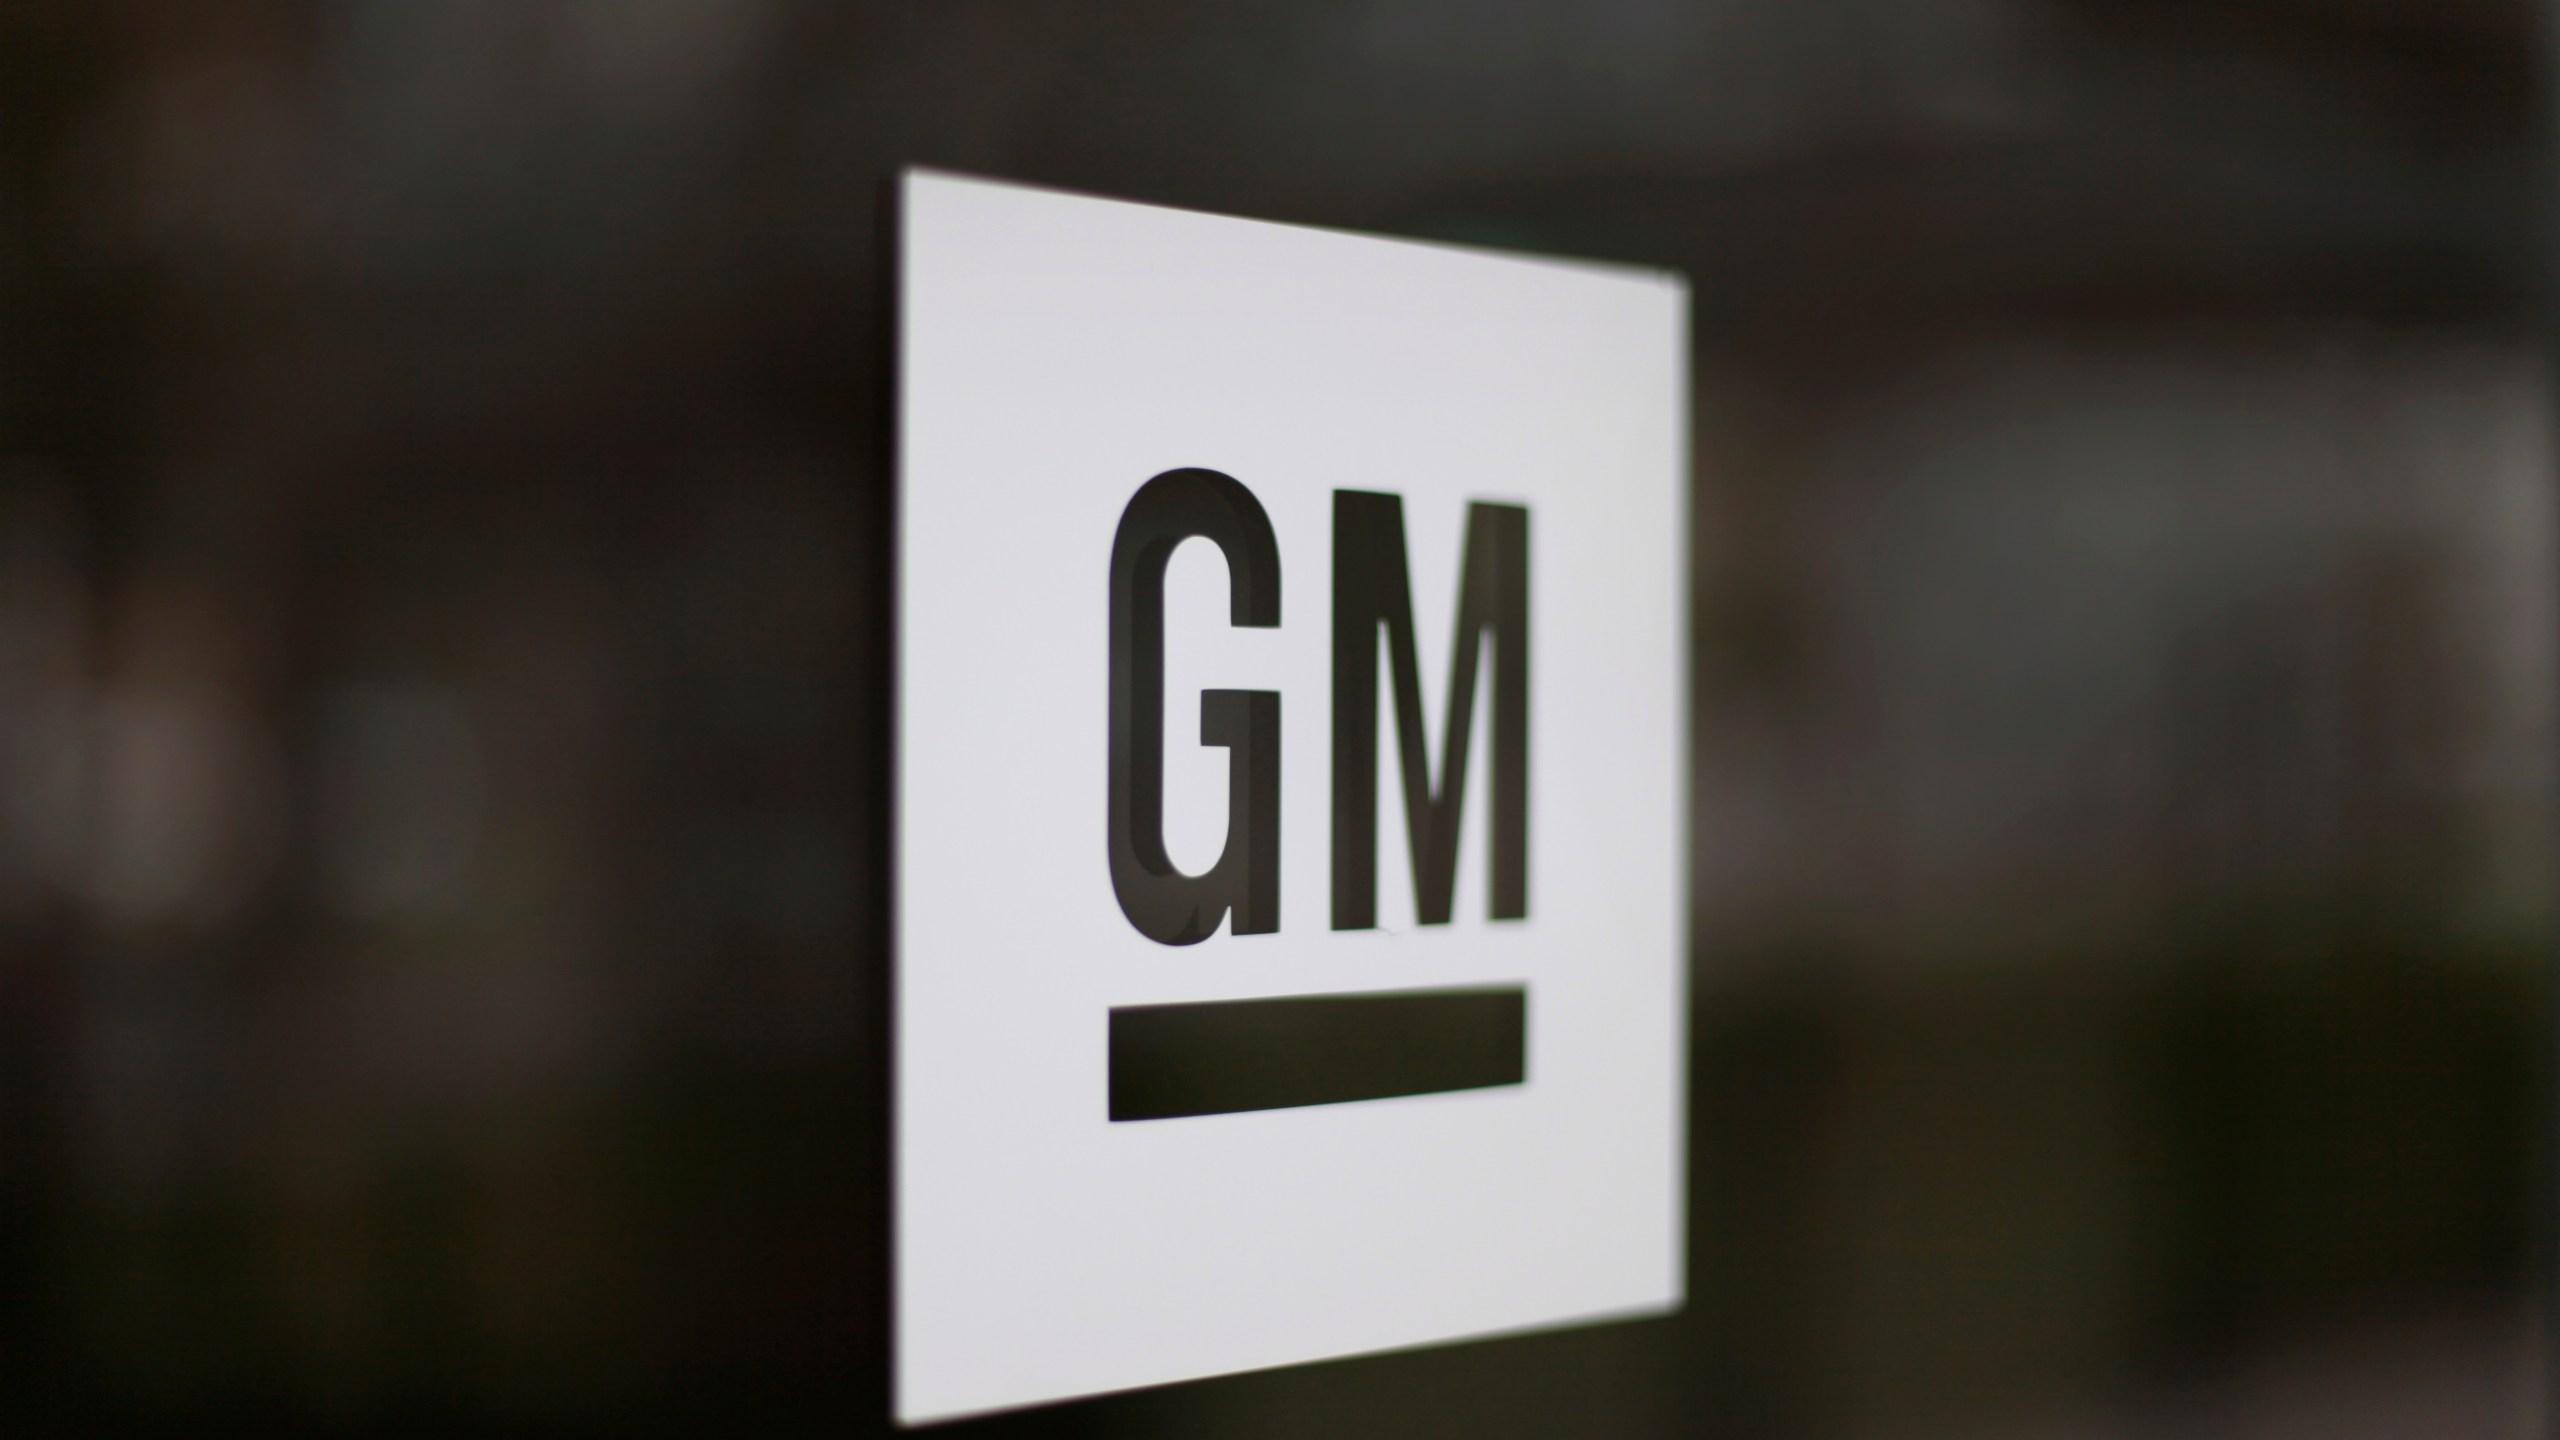 General_Motors_Brake_Investigation_33392-159532.jpg80927482